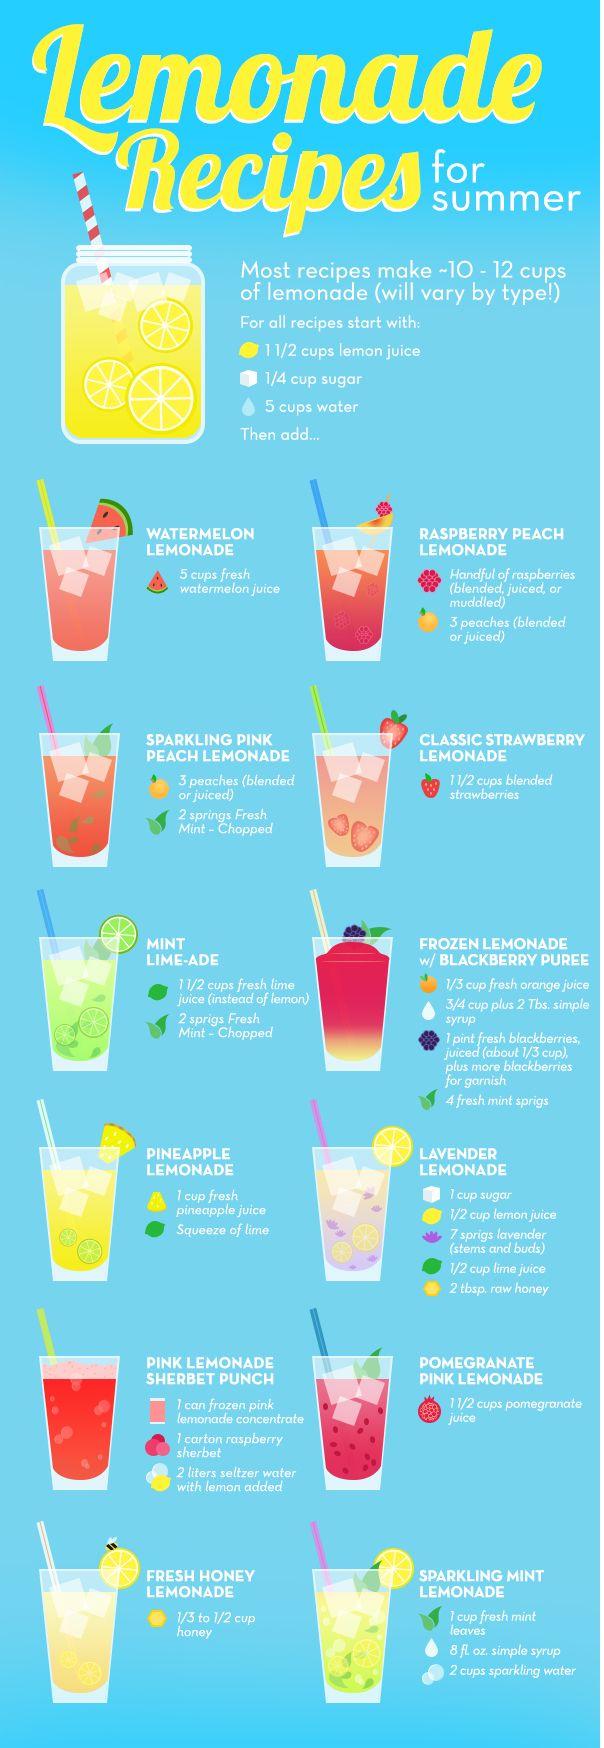 12 Unique Lemonade Recipes For Summer